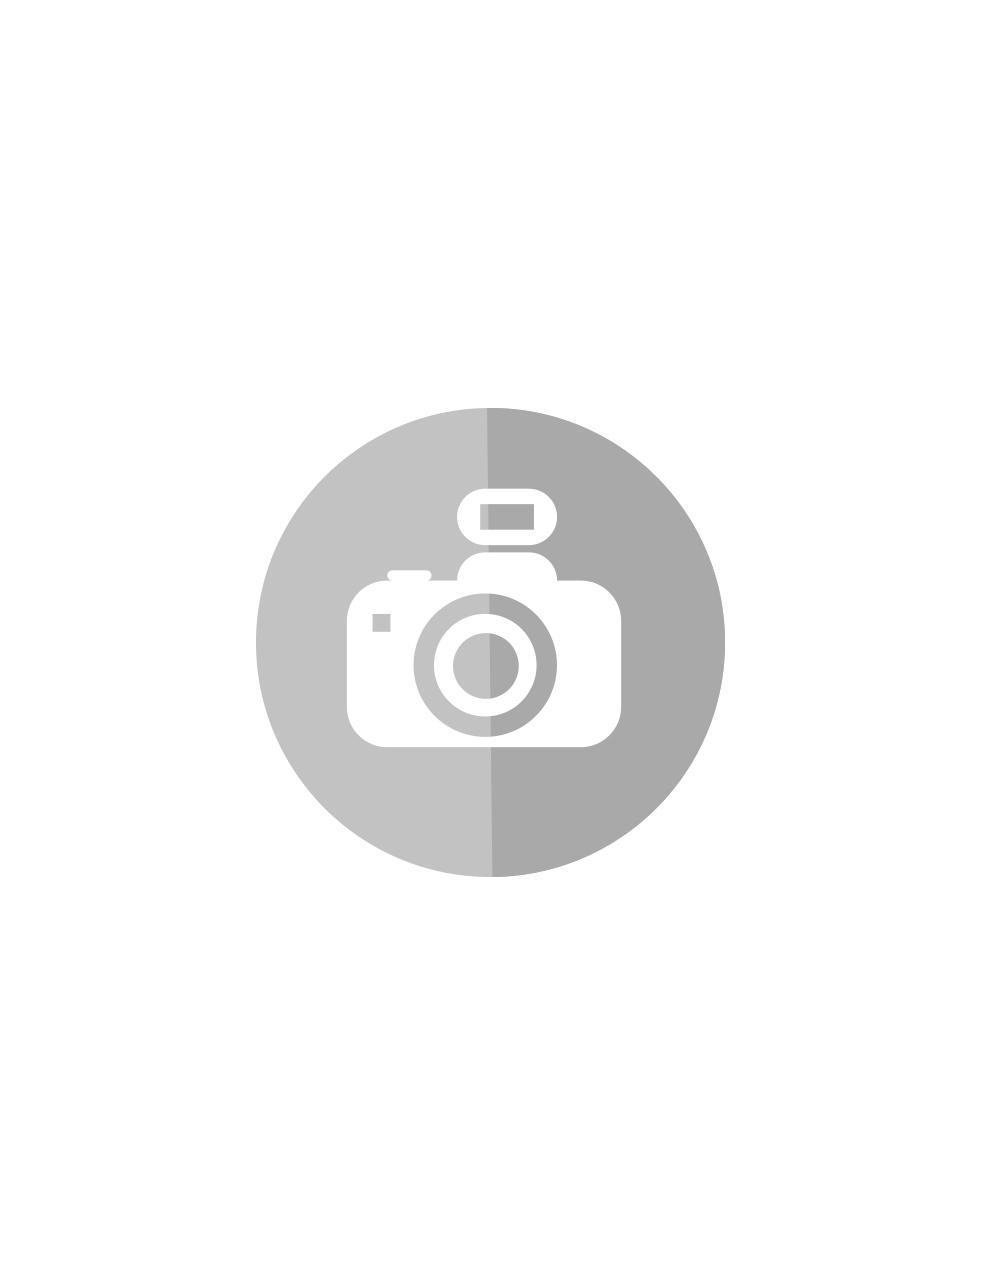 category_image_S_ARTIKEL